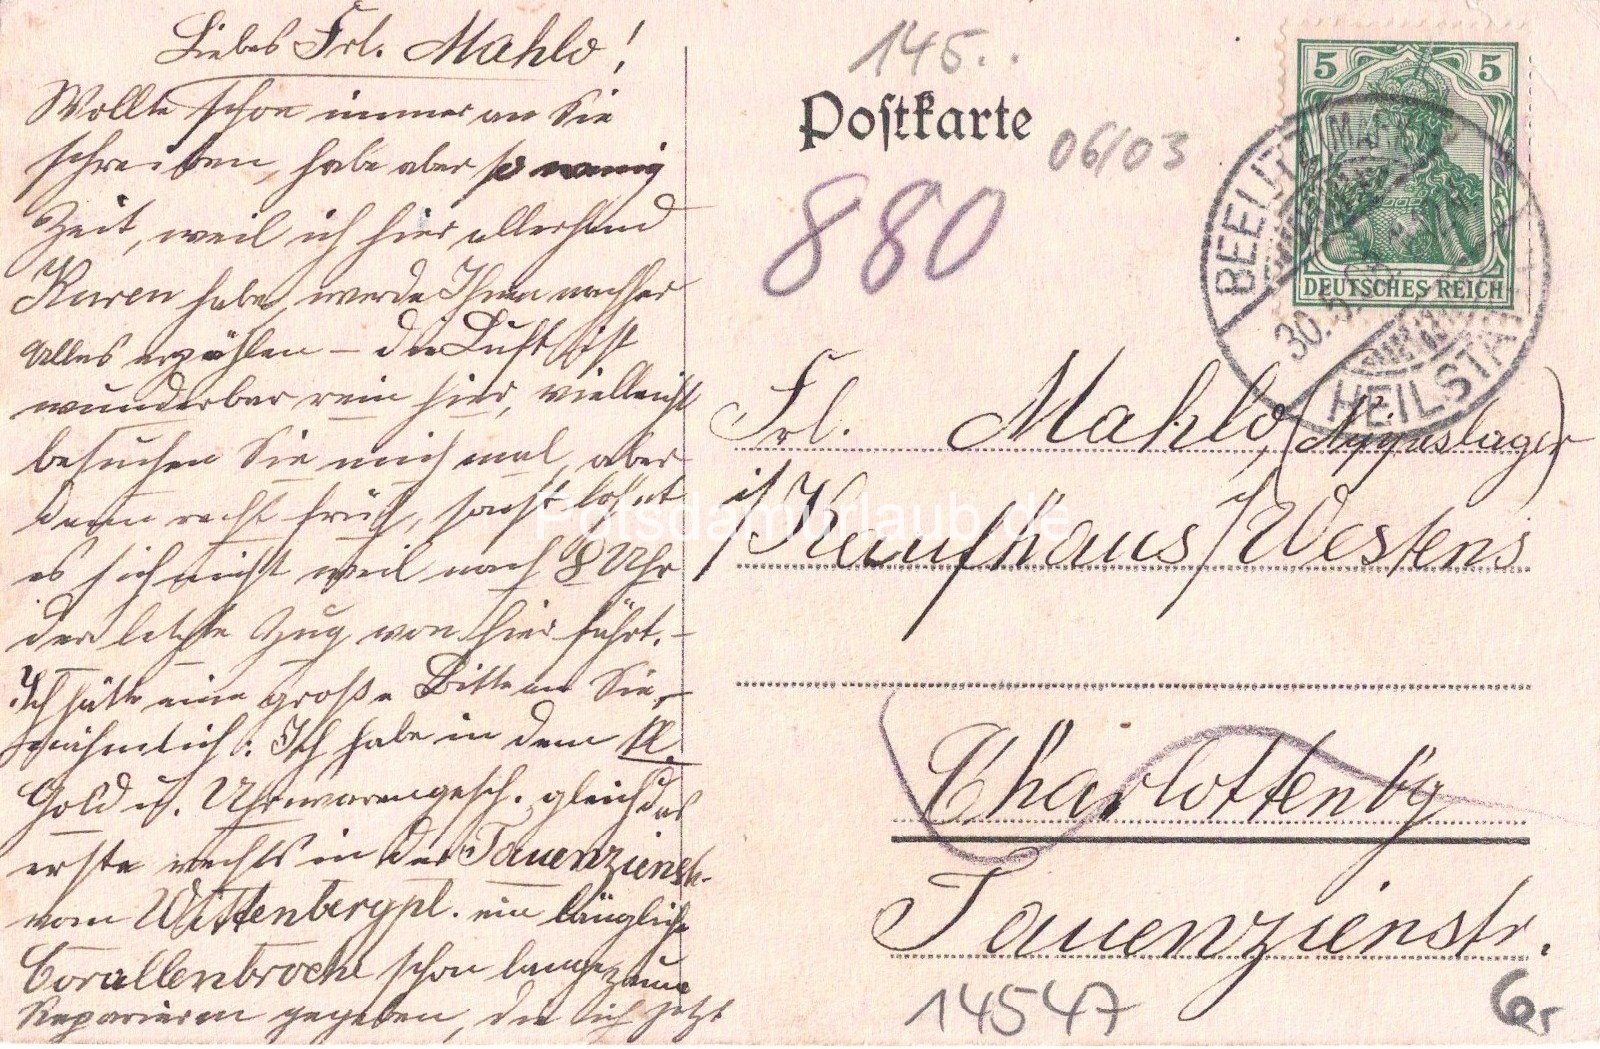 1908 05 30